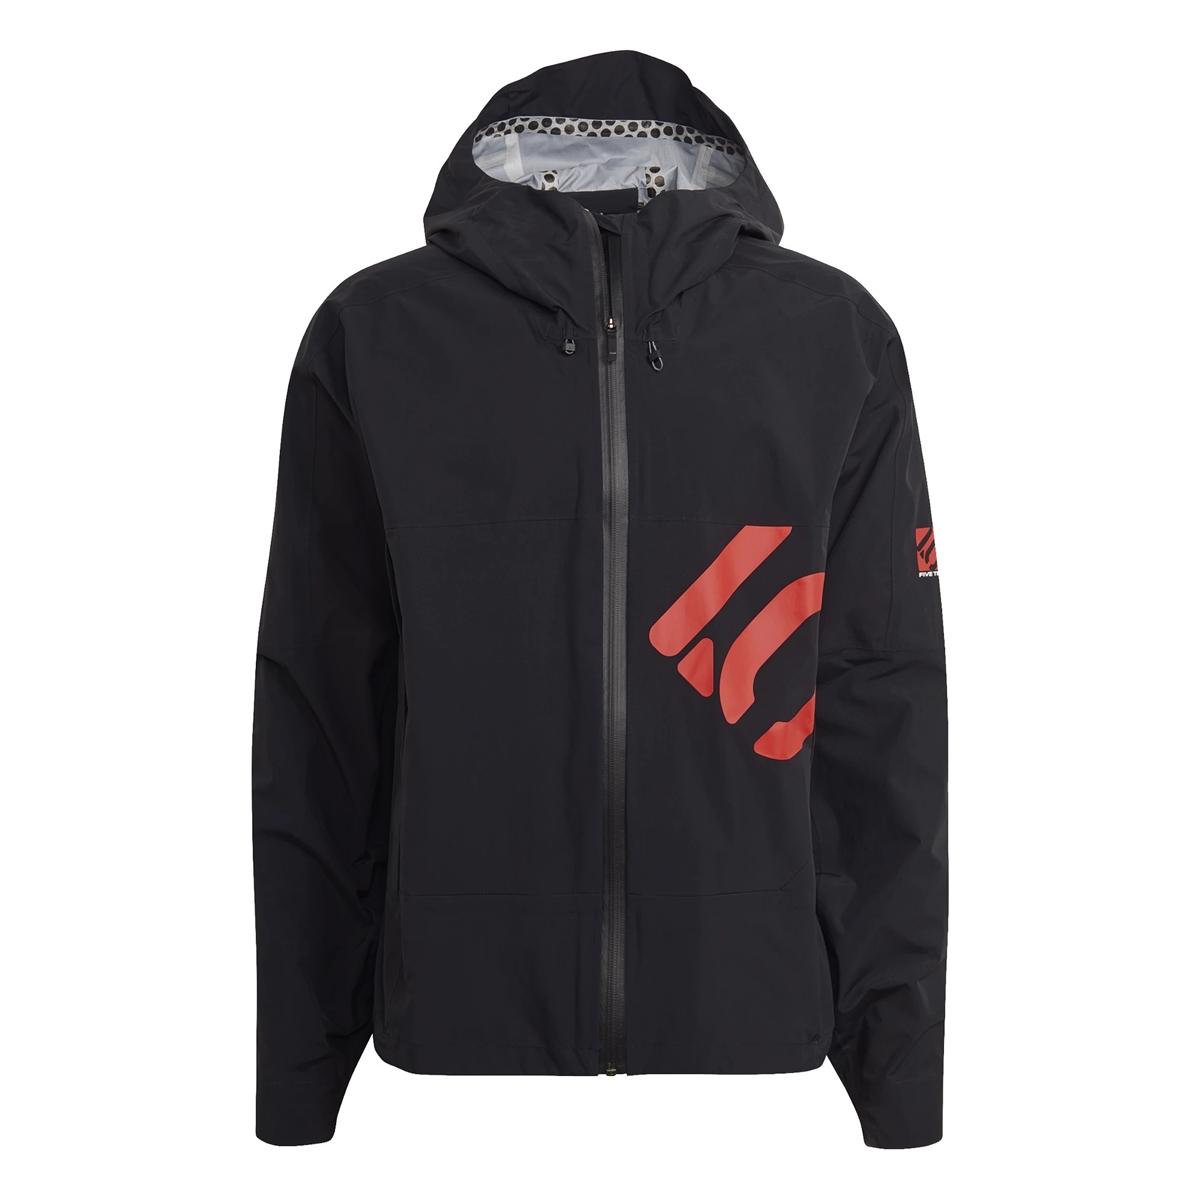 Rain Jacket 5.10 RAIN JKT Black 2021 Size S